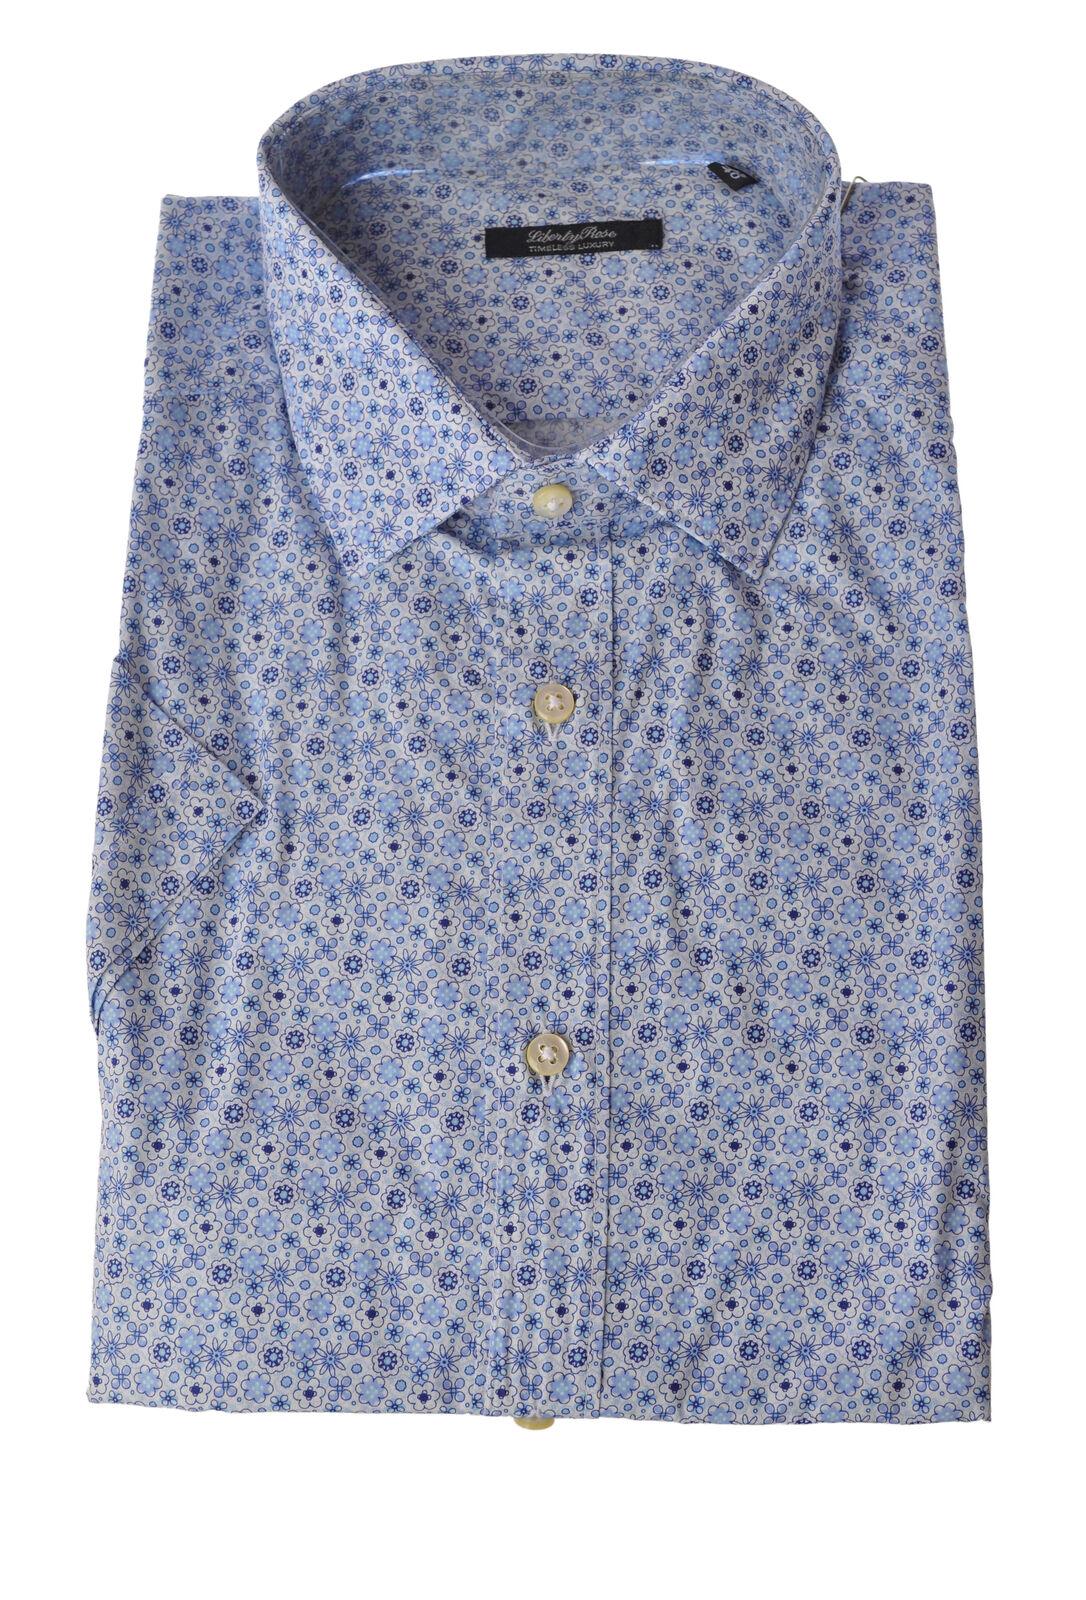 Liberty Rose  -  Shirt - Male - Fantasy - 3513522A185349